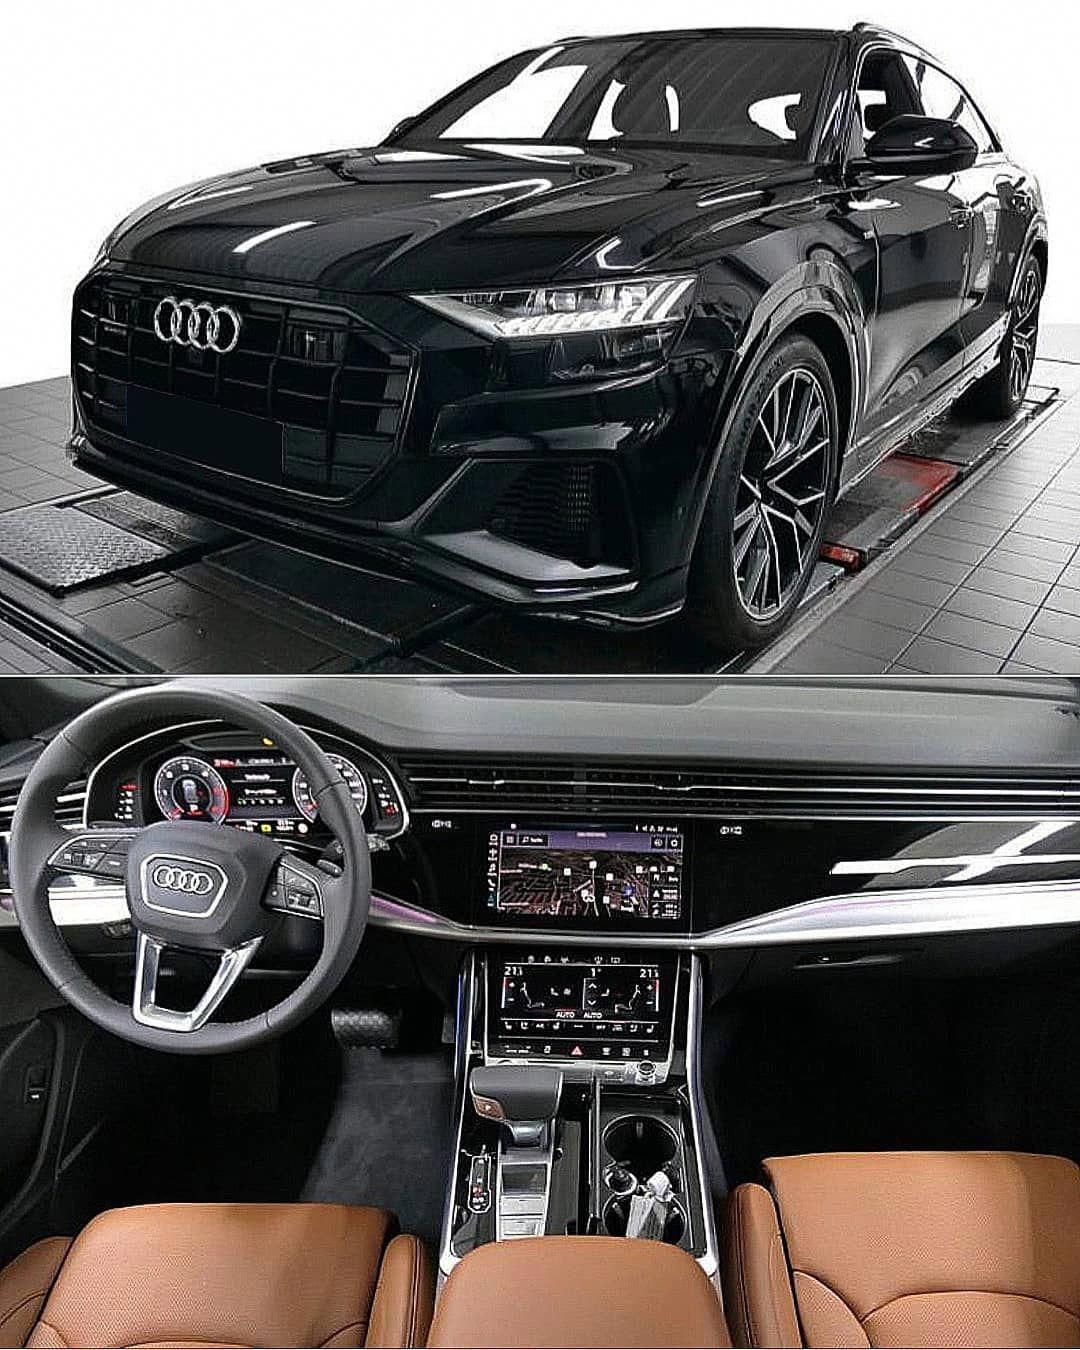 Kelebihan Audi Carros Review